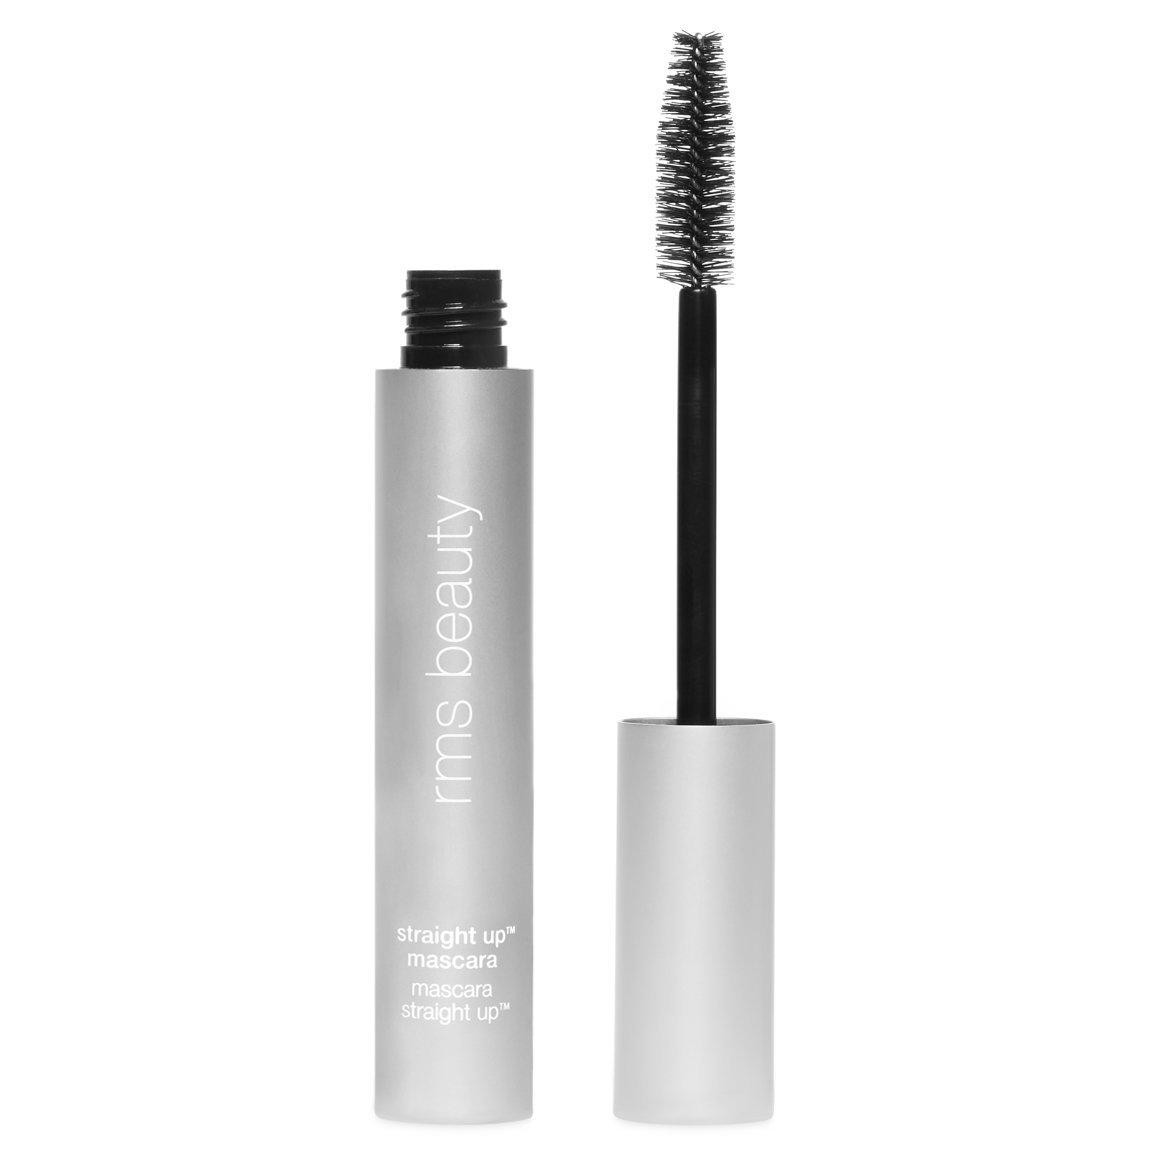 rms beauty Straight Up Volumizing Peptide Mascara 10 ml alternative view 1 - product swatch.